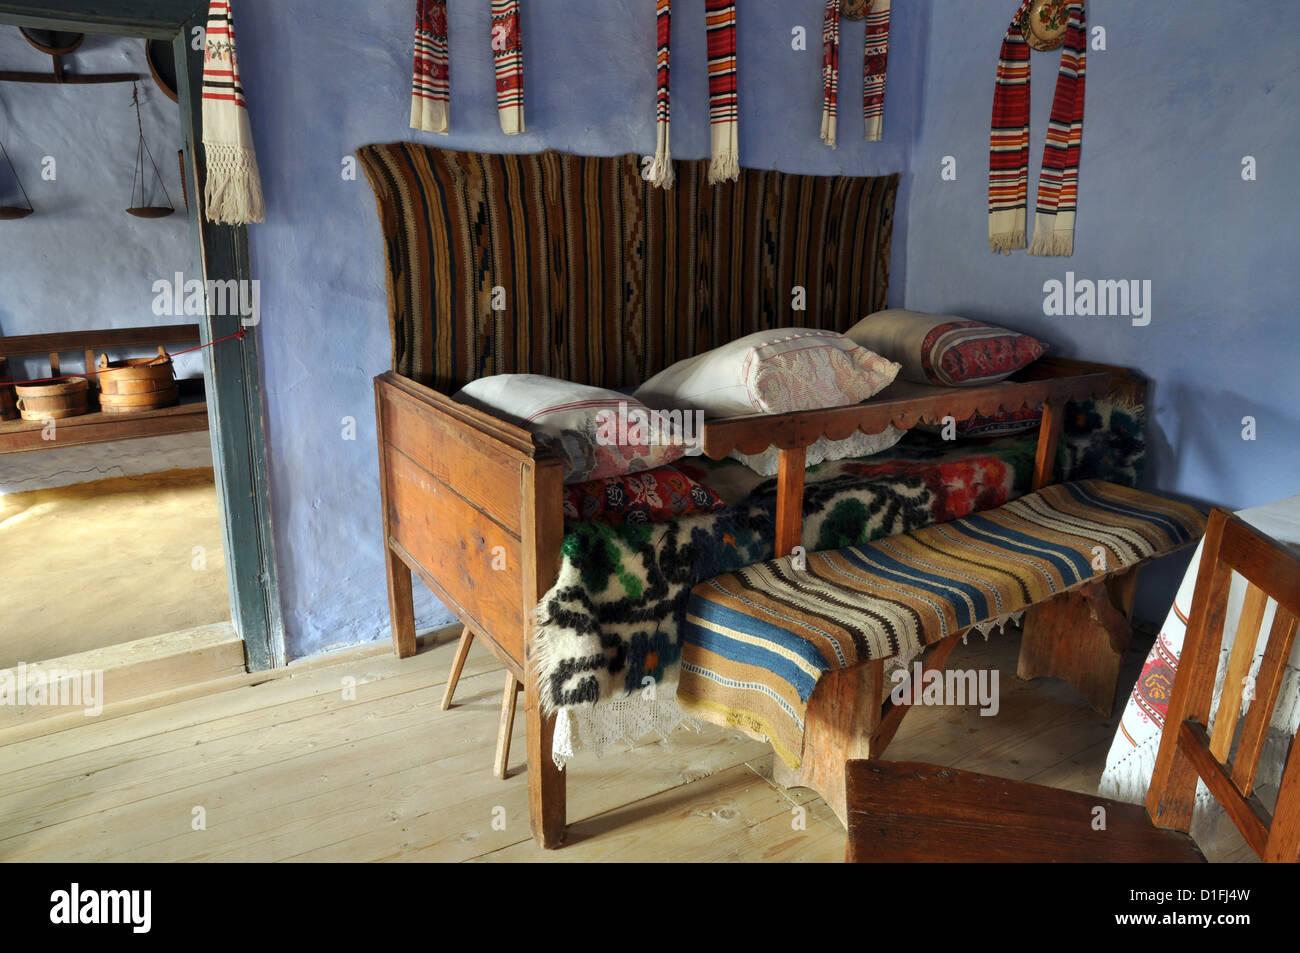 traditional romanian house interior in transylvania, romania stock